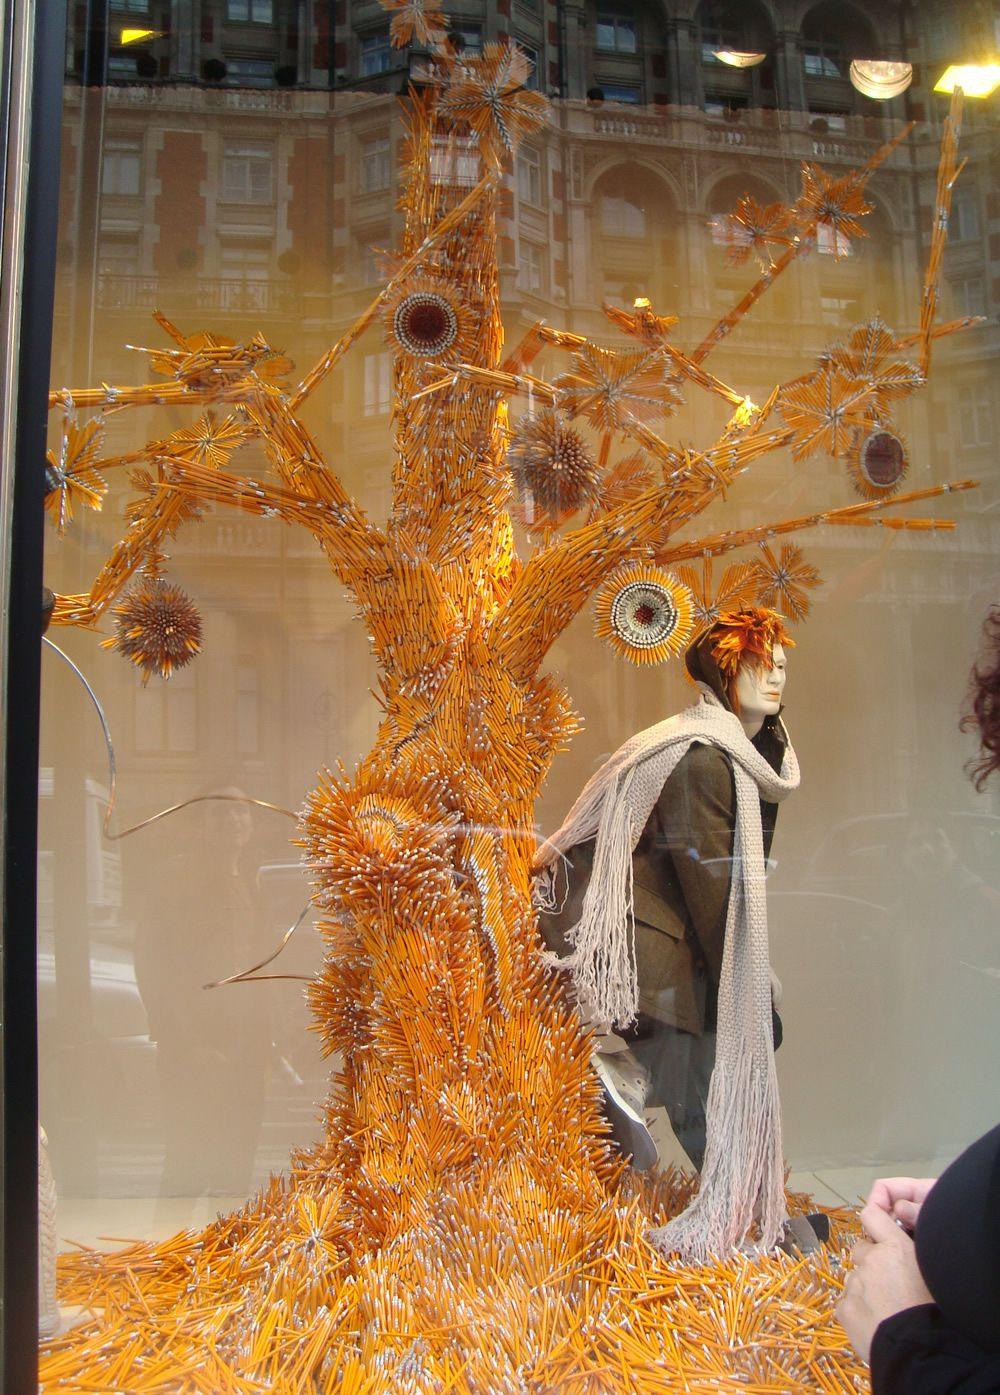 Shop window- Tree made of pencils